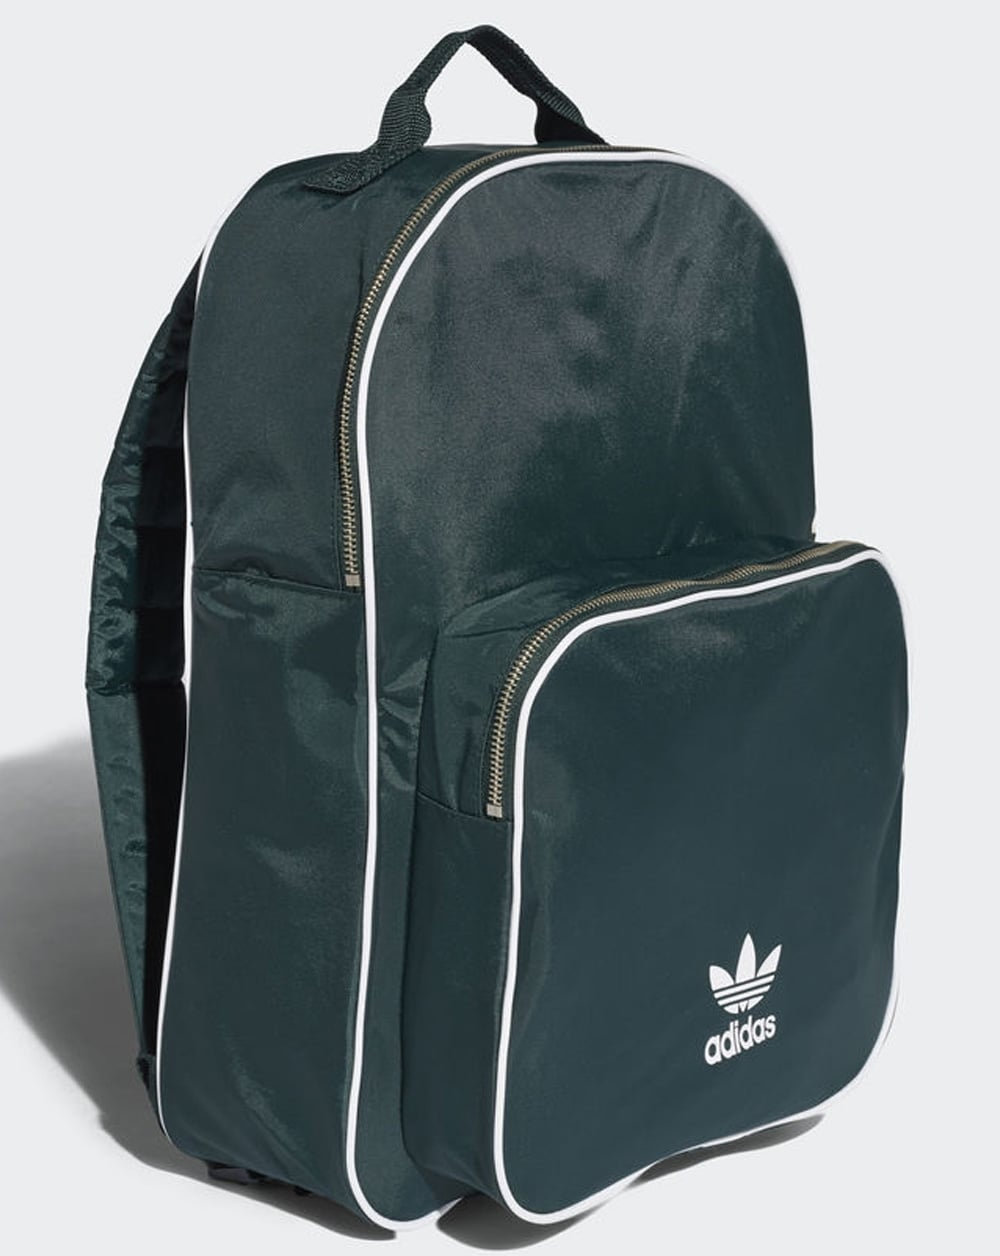 963aeb1b40 adidas Originals Adidas Originals Adicolor Backpack Green Night